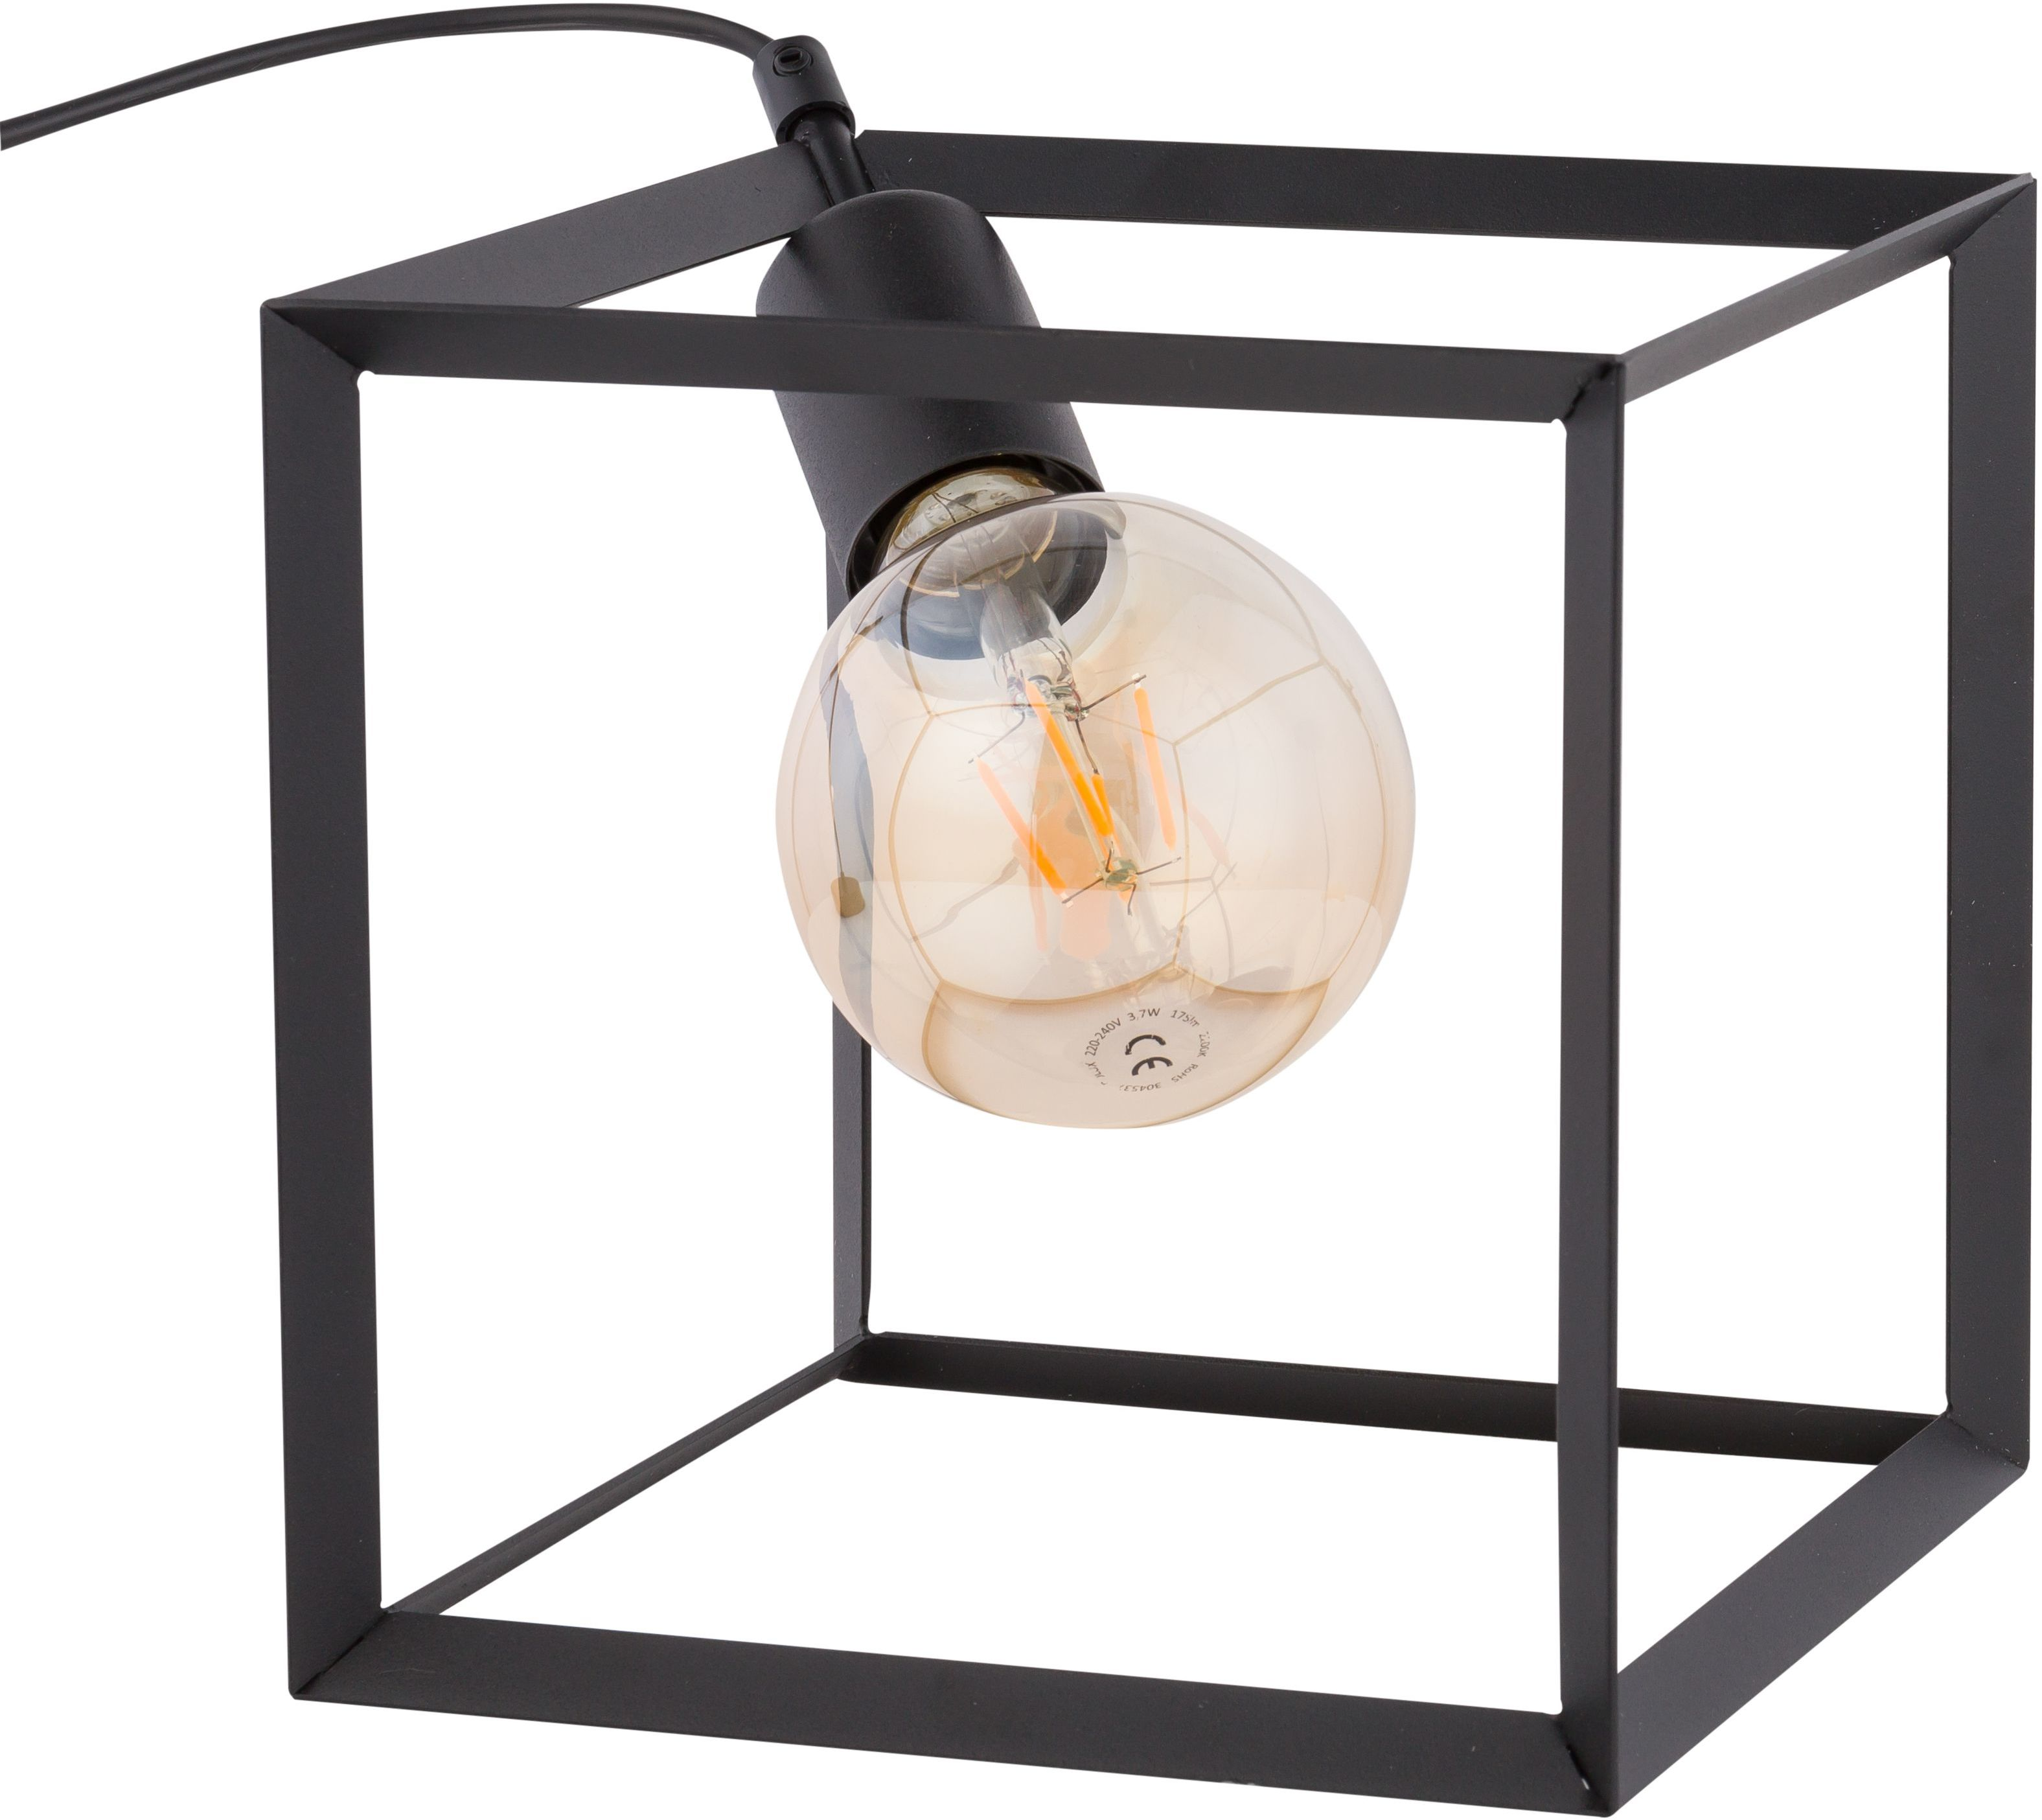 SIGMA LAMPA STOŁOWA CUBE 50220